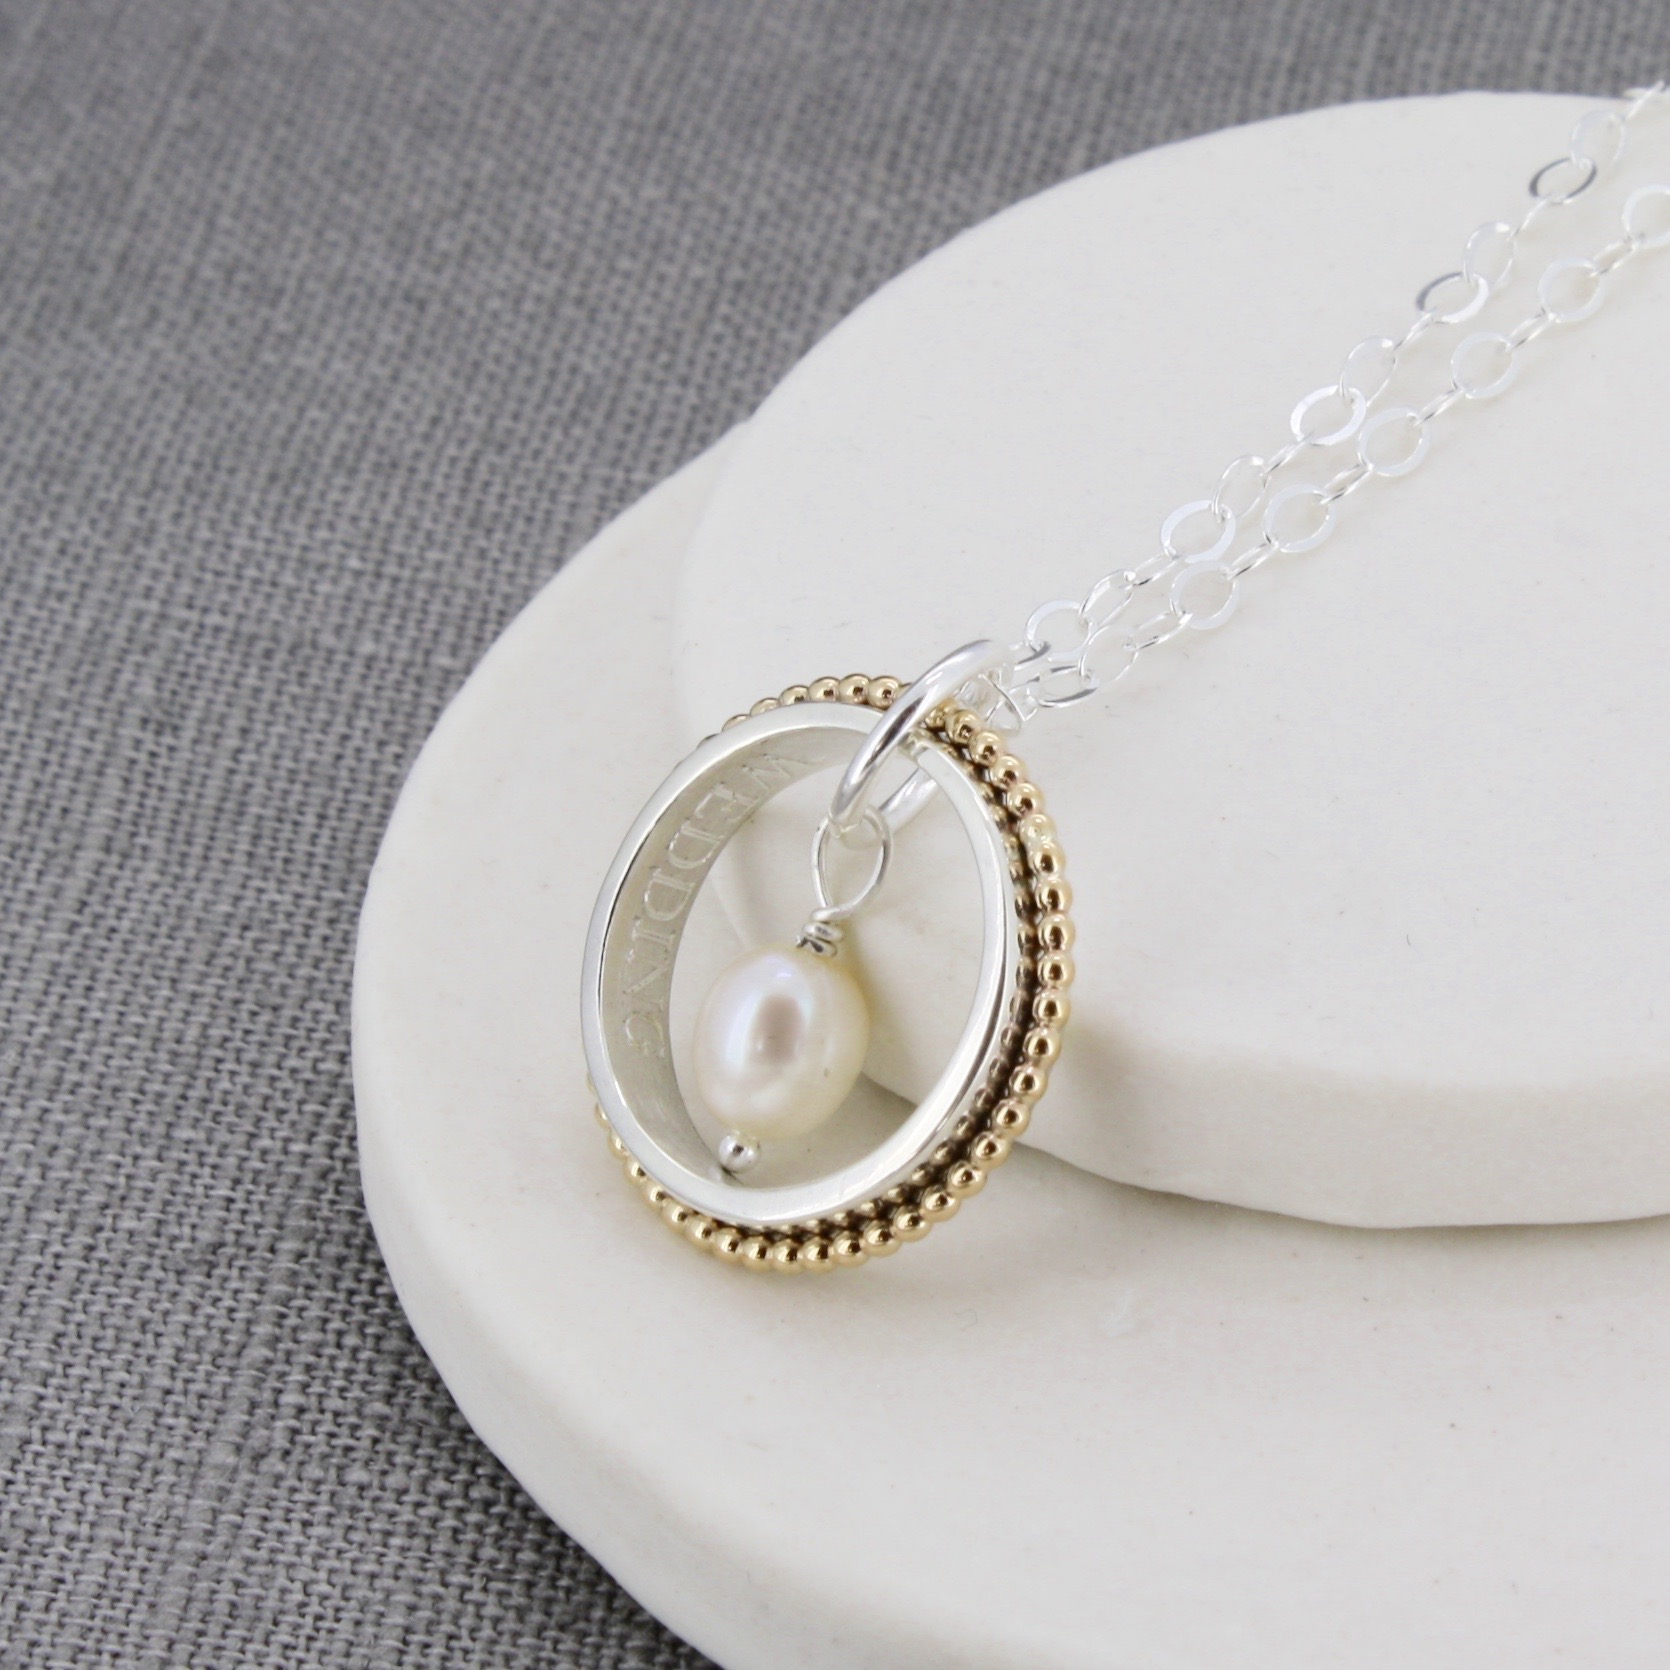 Personalised pearl ring pendant